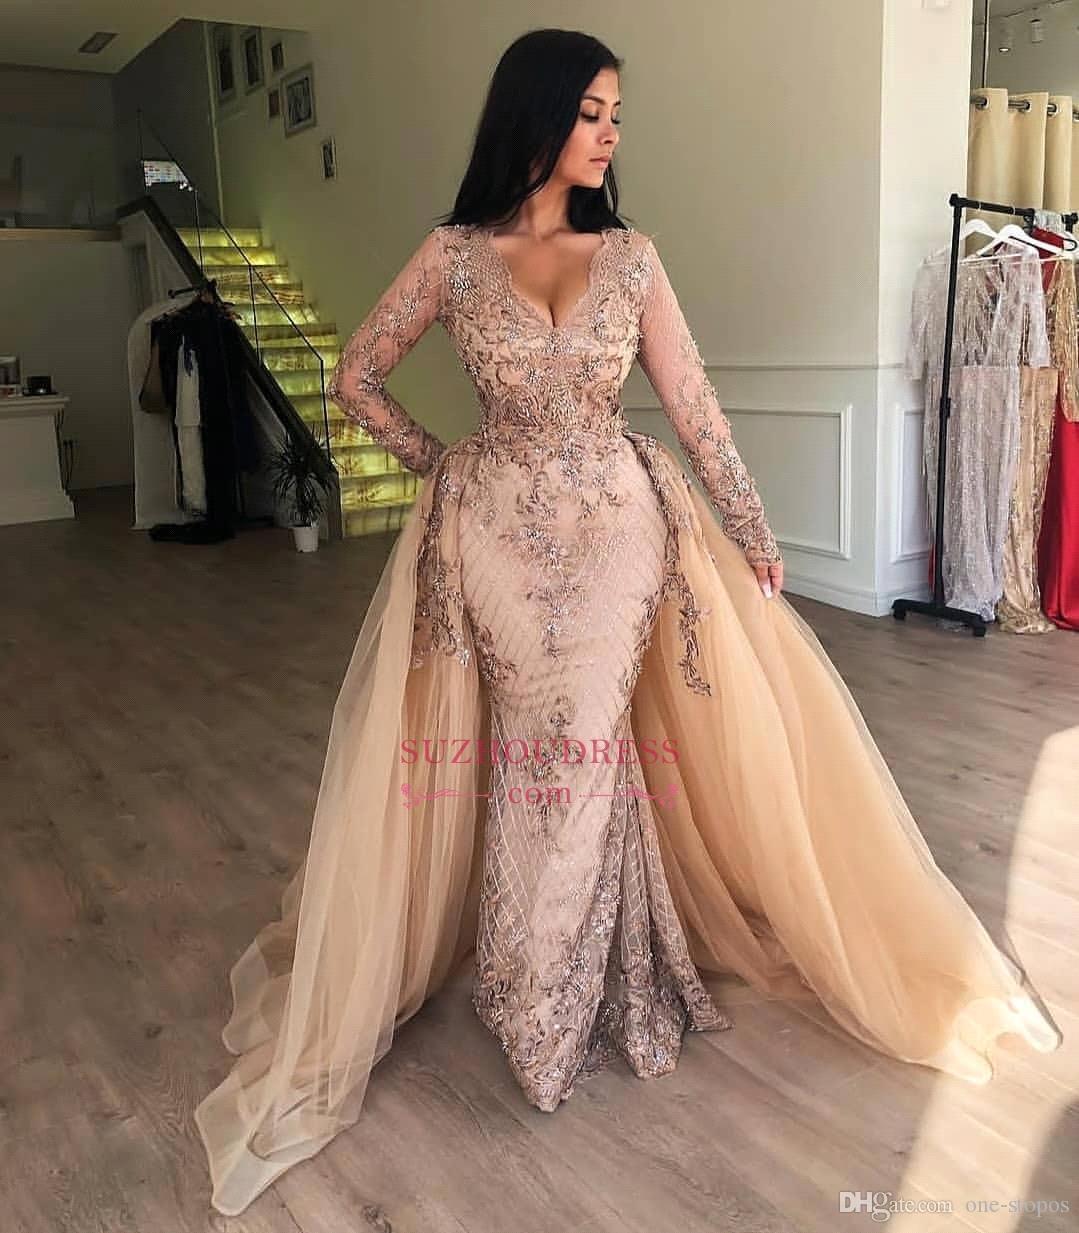 Formal Cool Abendkleider Mit Tüll Spezialgebiet10 Luxus Abendkleider Mit Tüll für 2019